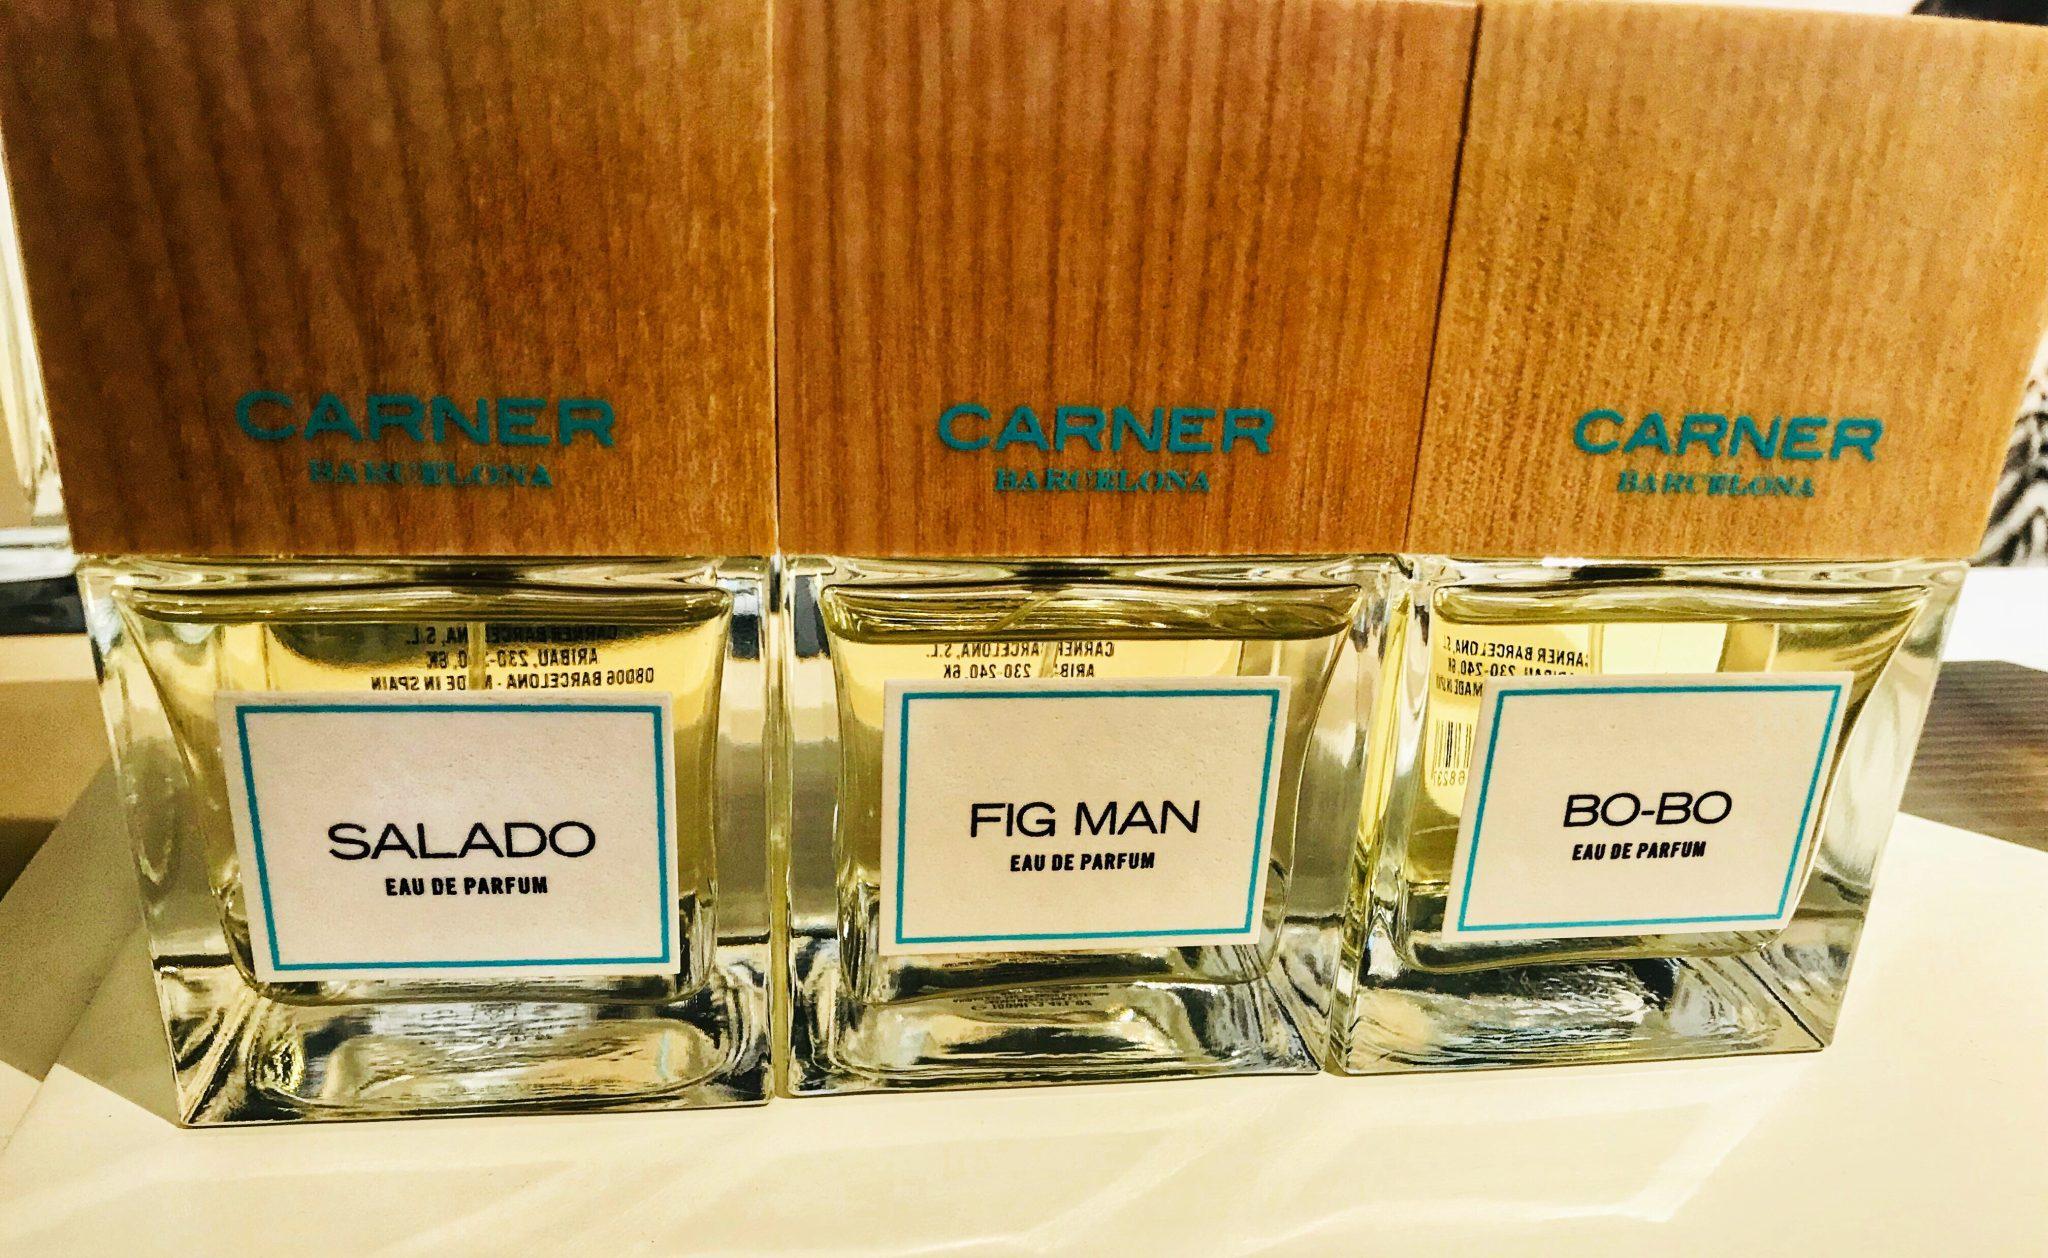 Carner Barcelona Fresh Collection